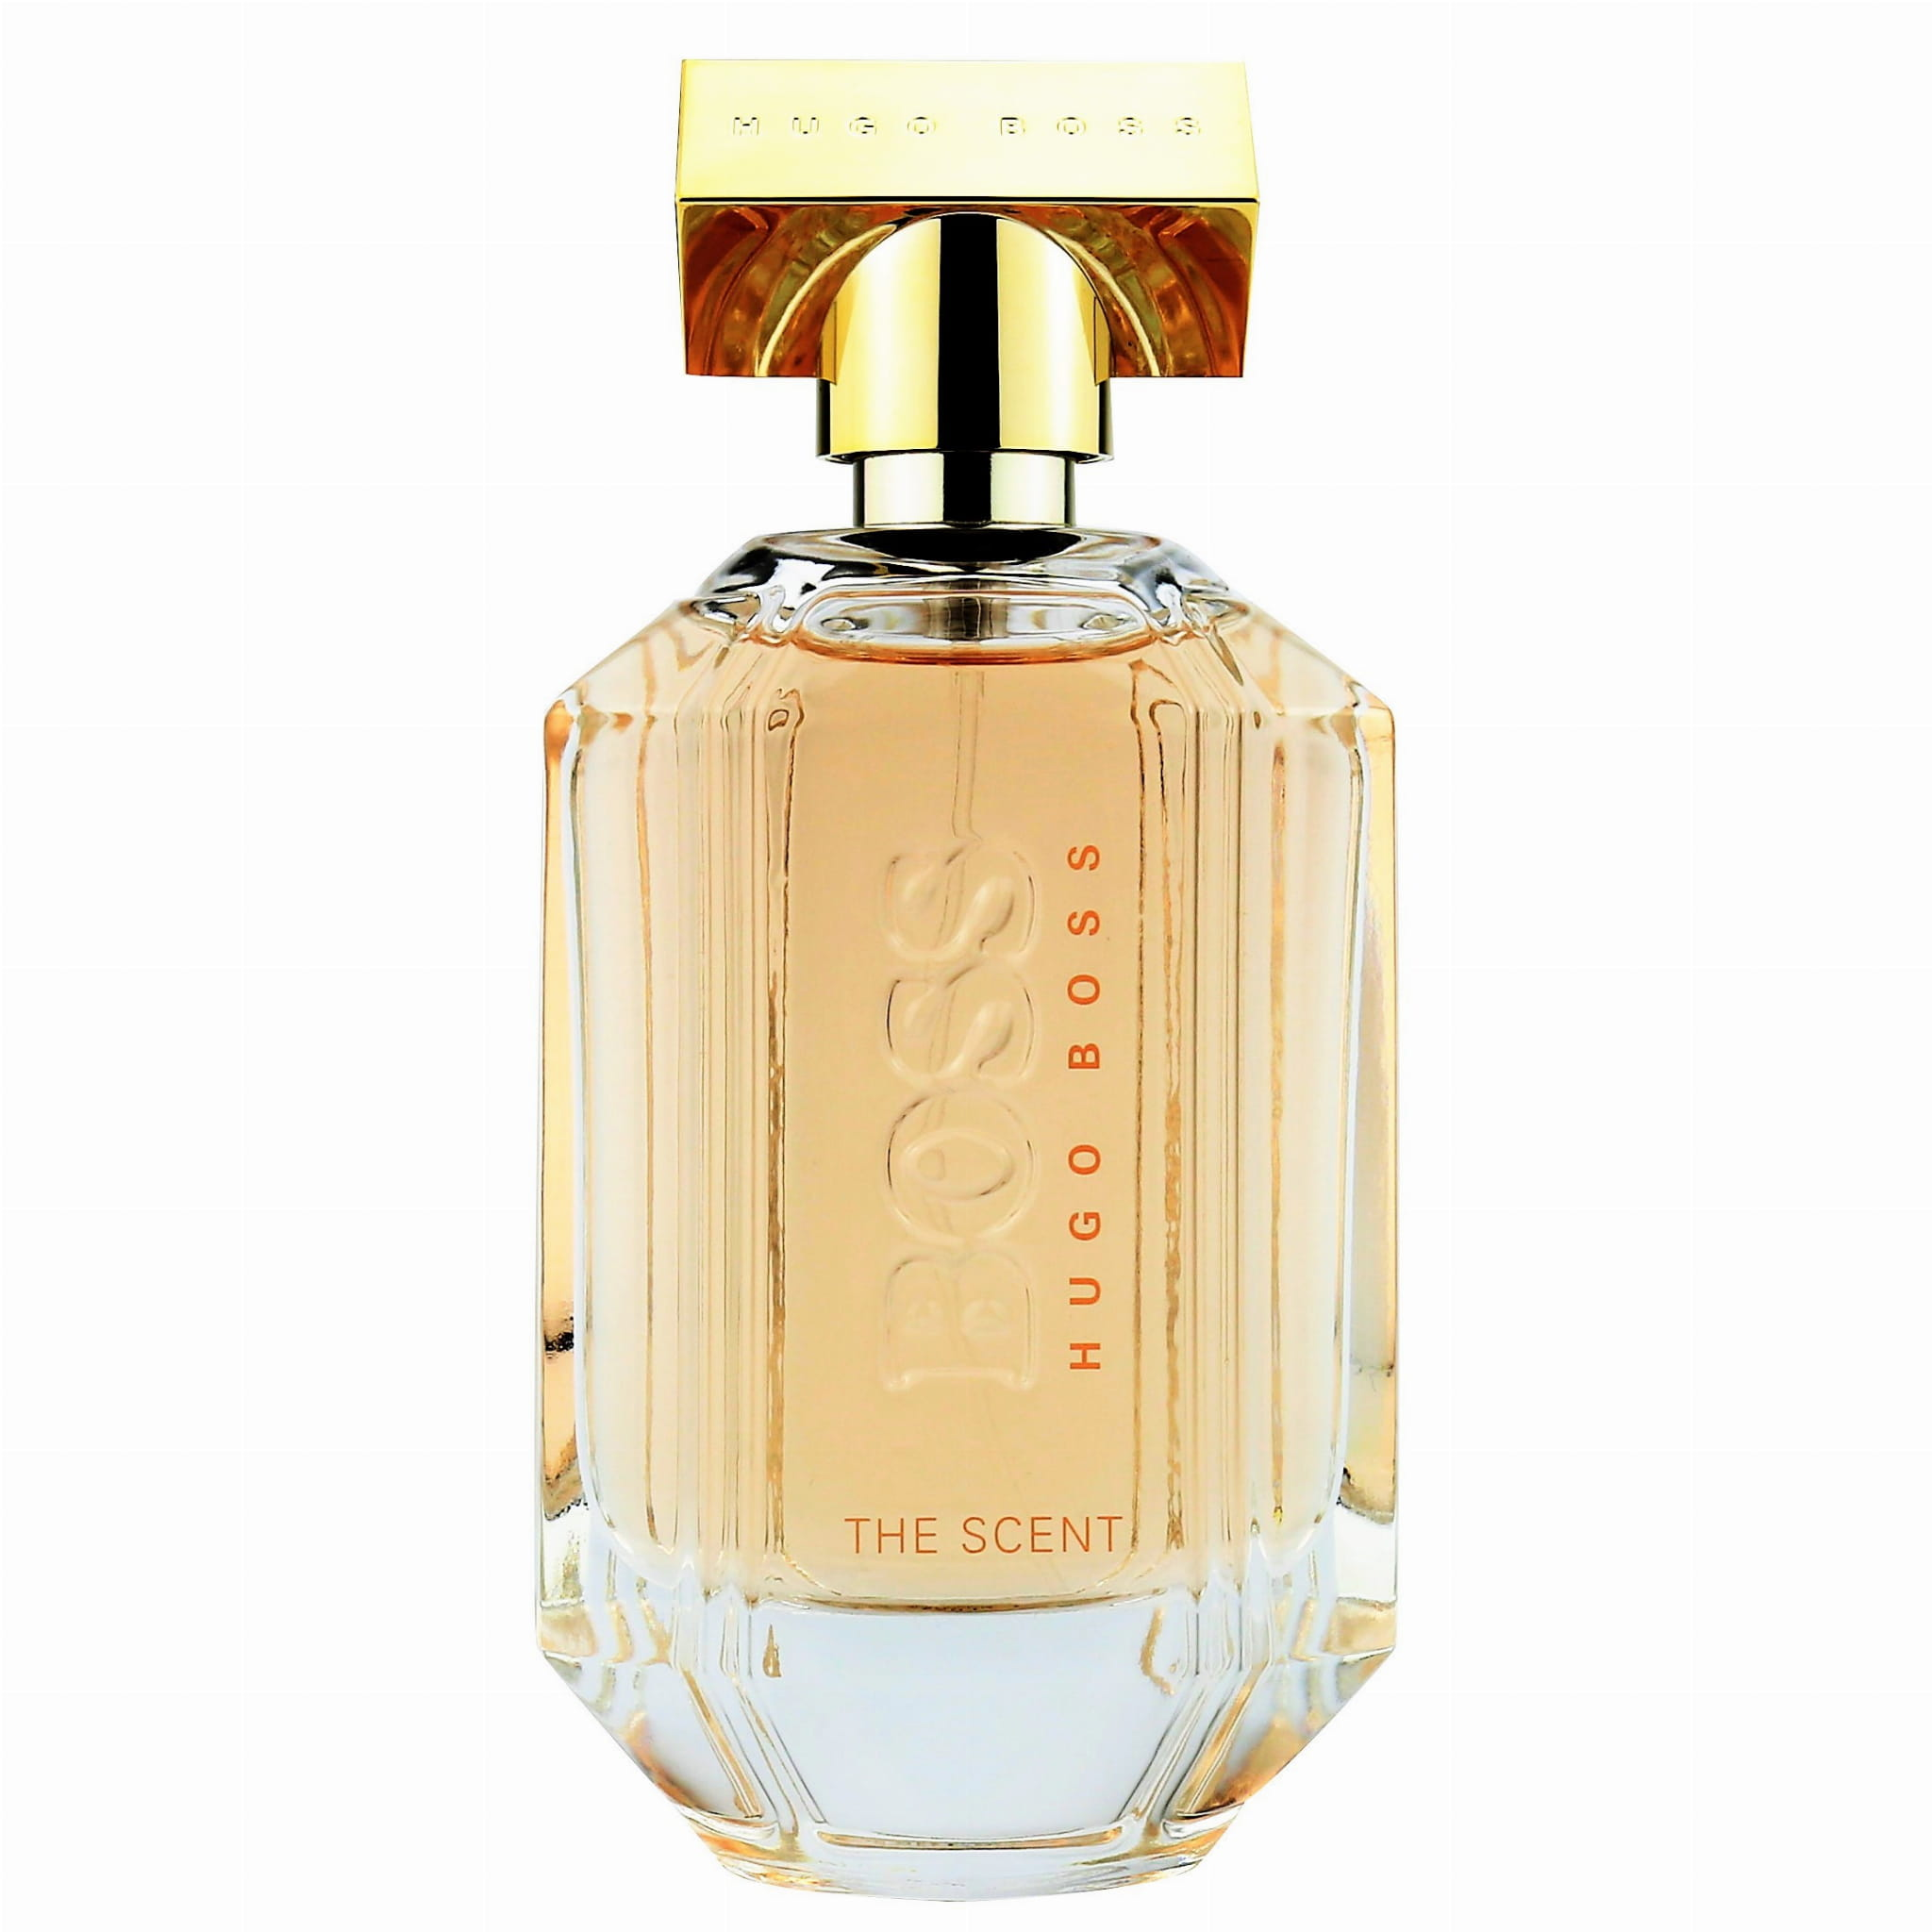 c8863b2ef174a HUGO BOSS The Scent for Her Eau de Parfum - DÜFTE - Aduft.de